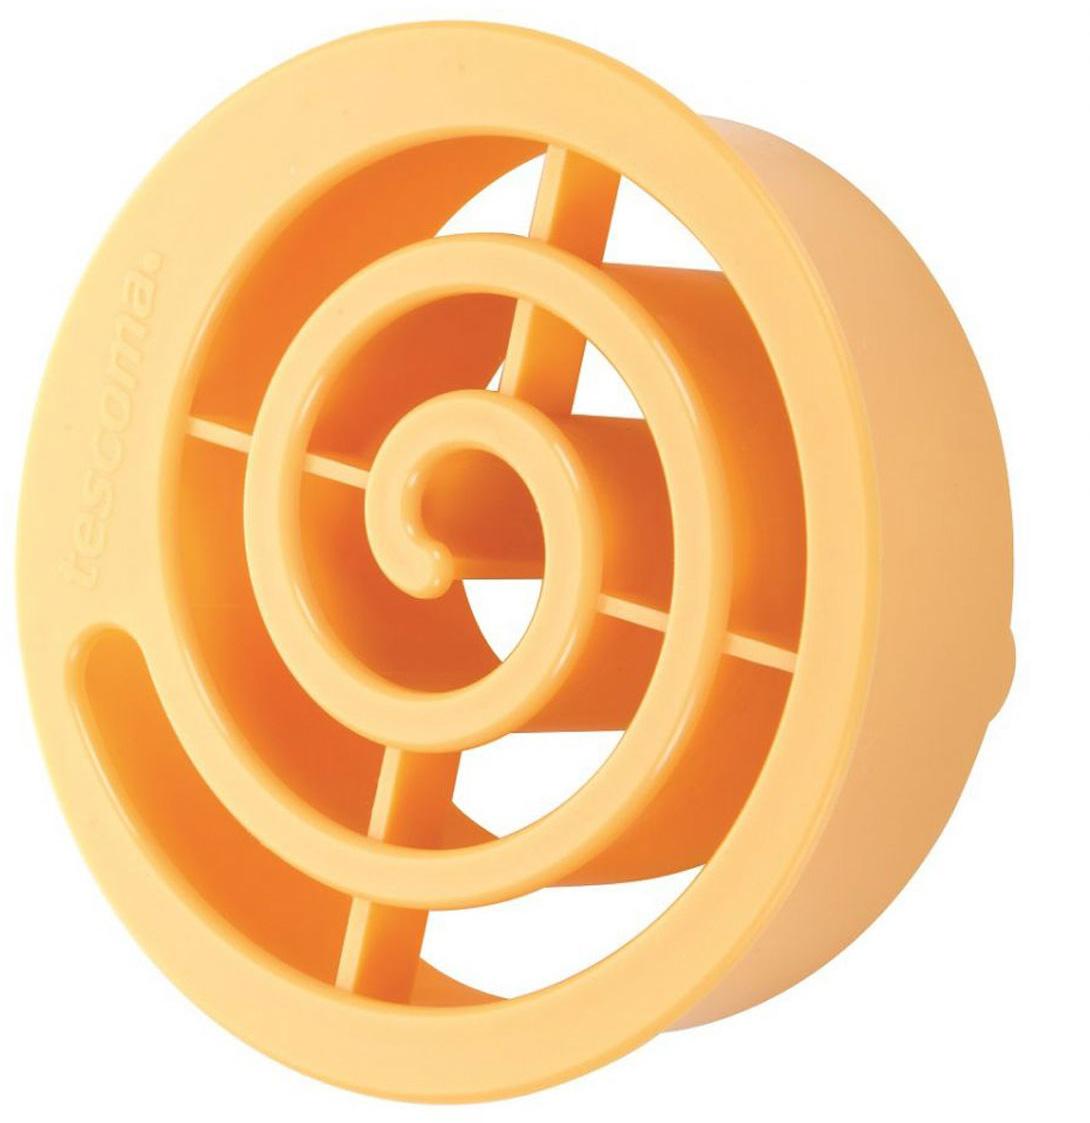 Форма для выпечки булочек Tescoma